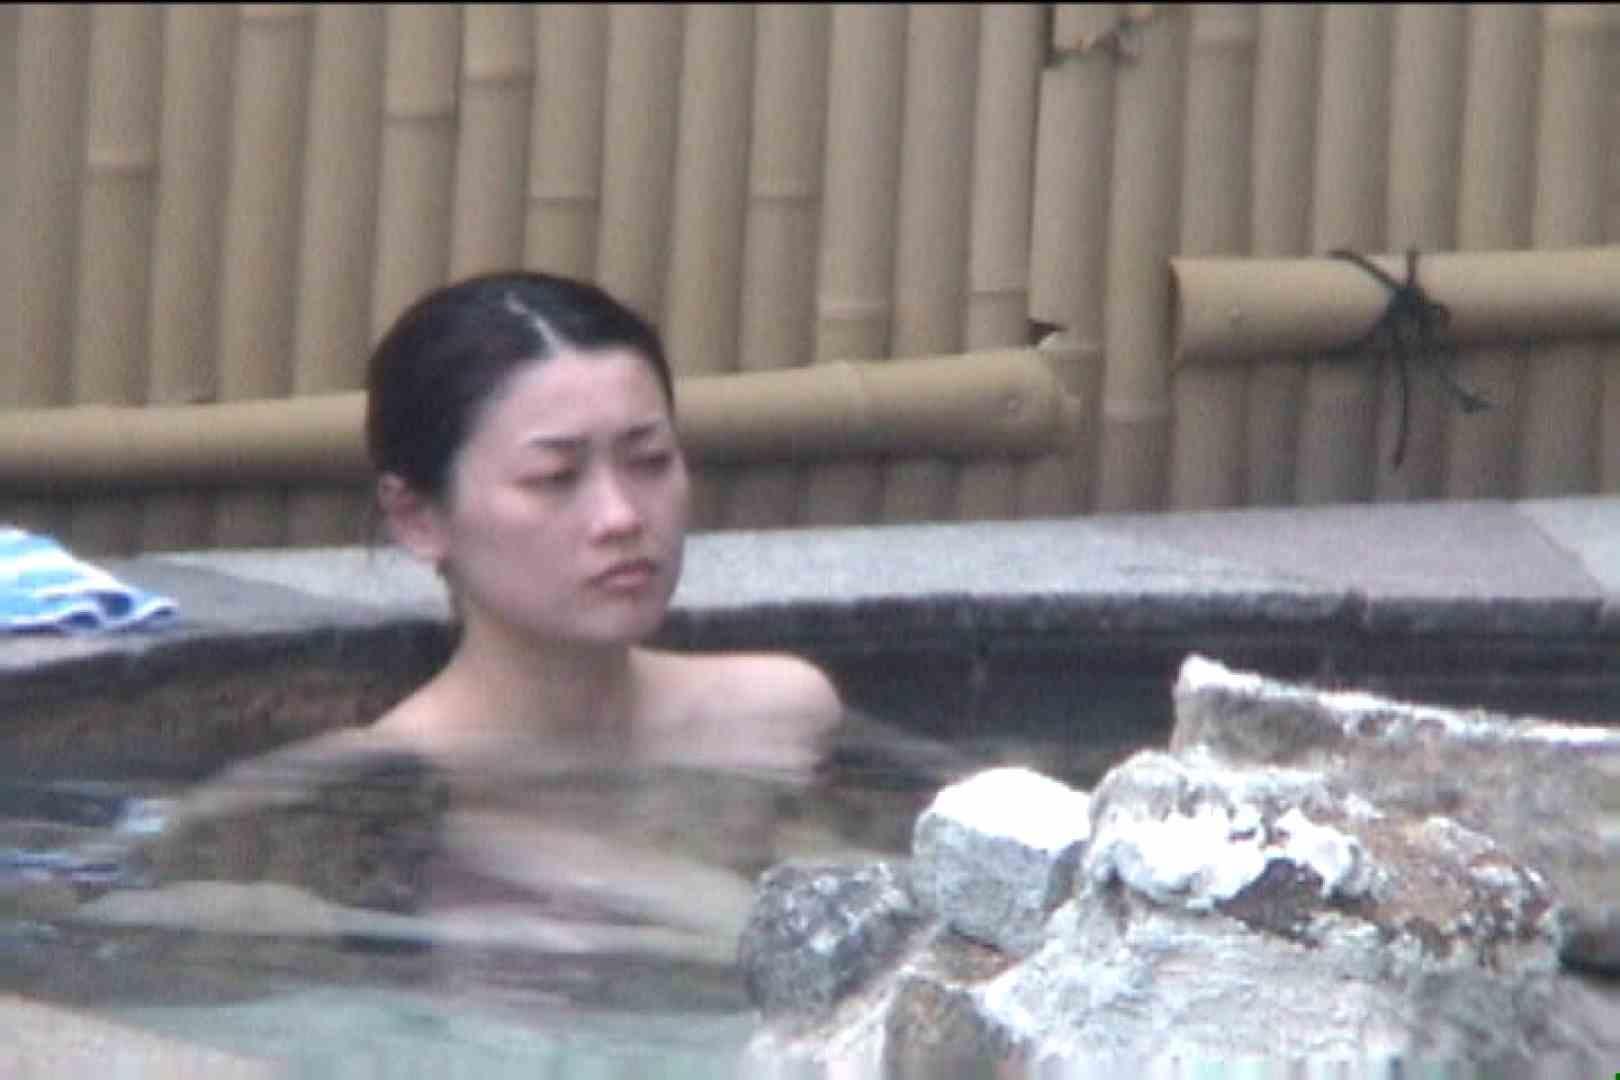 Aquaな露天風呂Vol.92【VIP限定】 露天 | 盗撮特撮  11pic 10